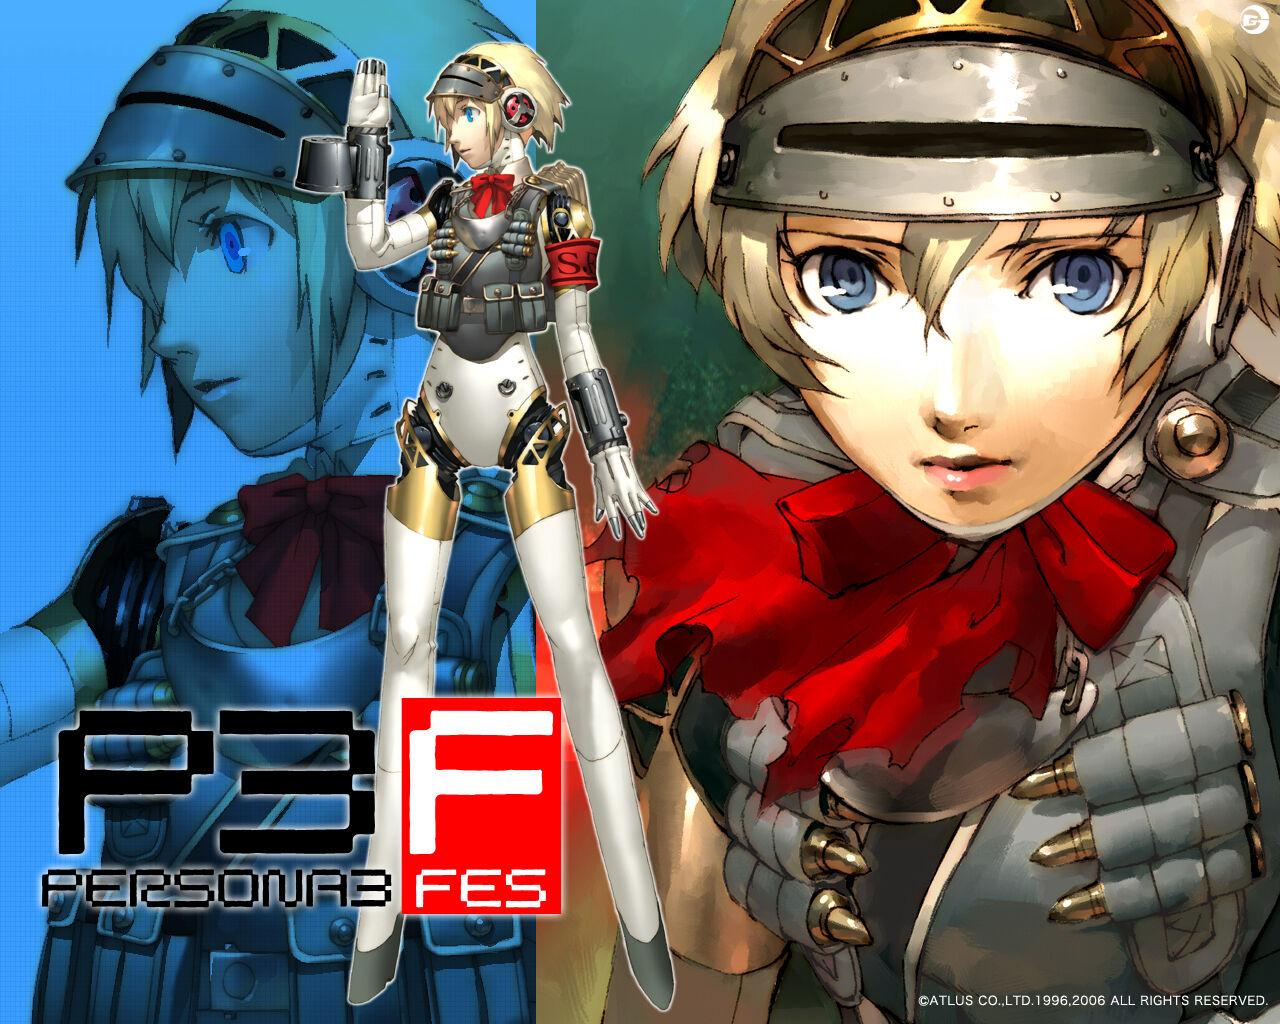 Shin Megami Tensei Persona 3 Fes Ps2 Playstation 2 2008